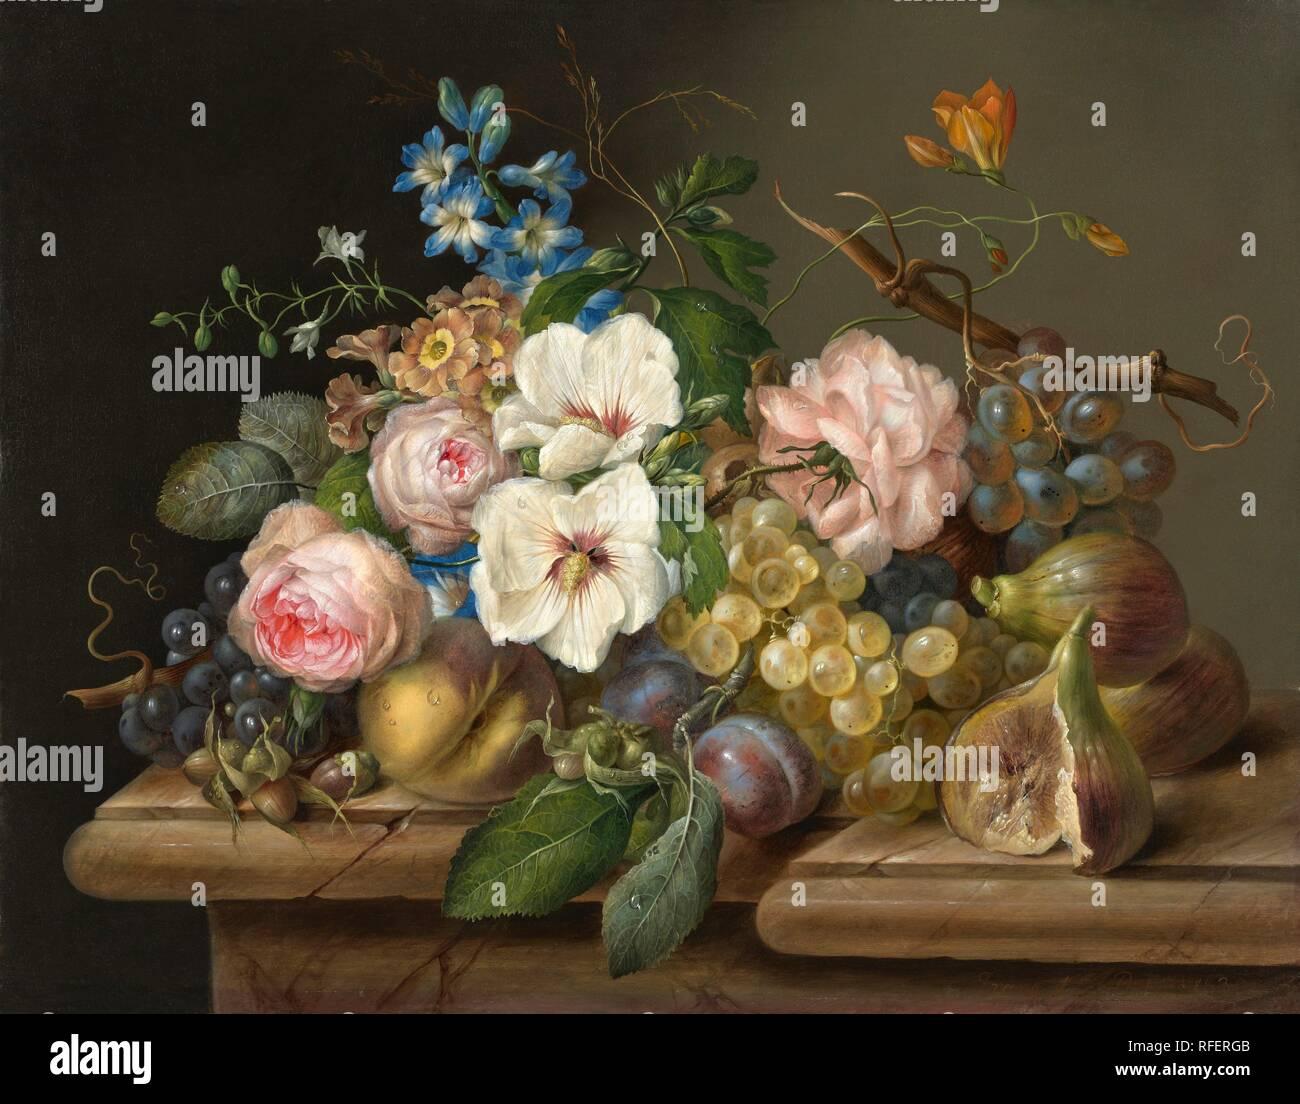 Franz Xaver Petter (1791 - Vienna - 1866) Two Flower Still Lifes, 1830.jpg - RFERGB - Stock Image